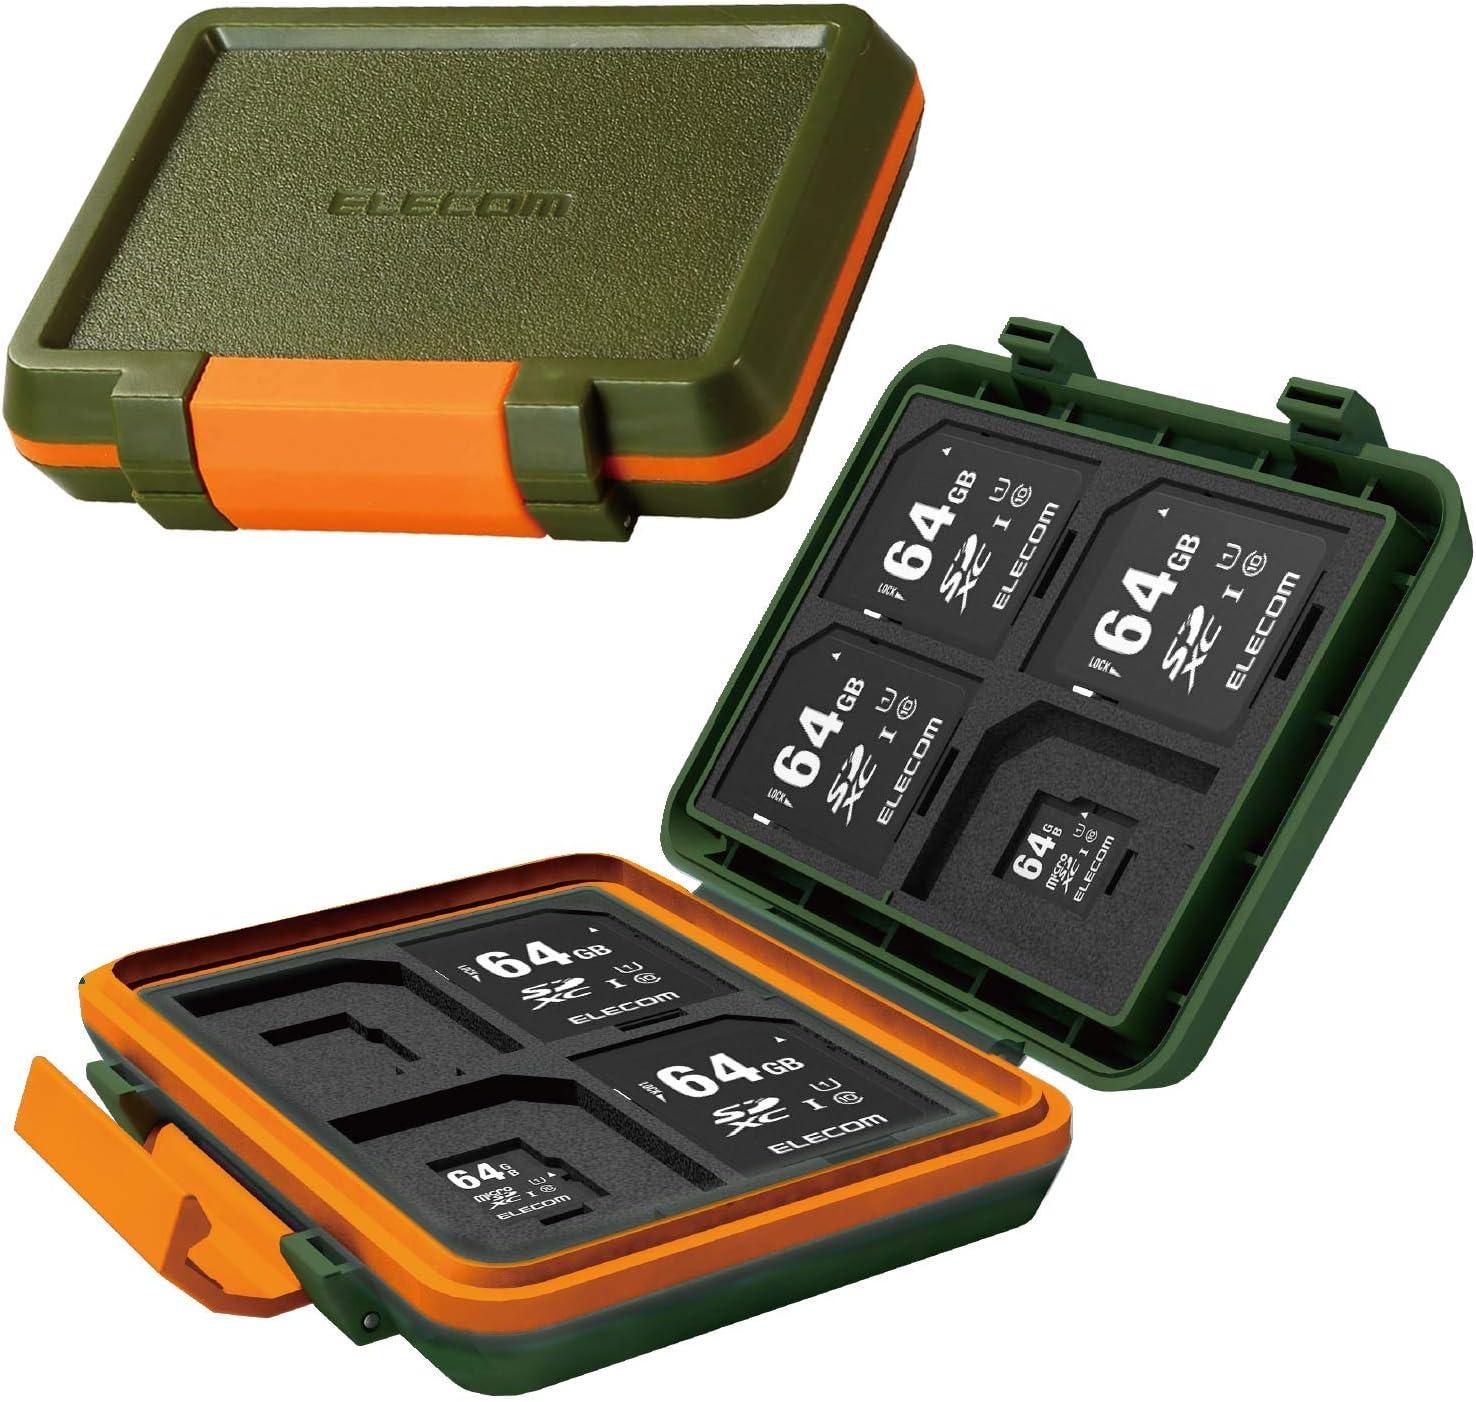 ELECOM Memory Card Case for 8 SD Cards and 8 microSD Cards, Shock-Resistant/Khaki/CMC-SDCHD01GN